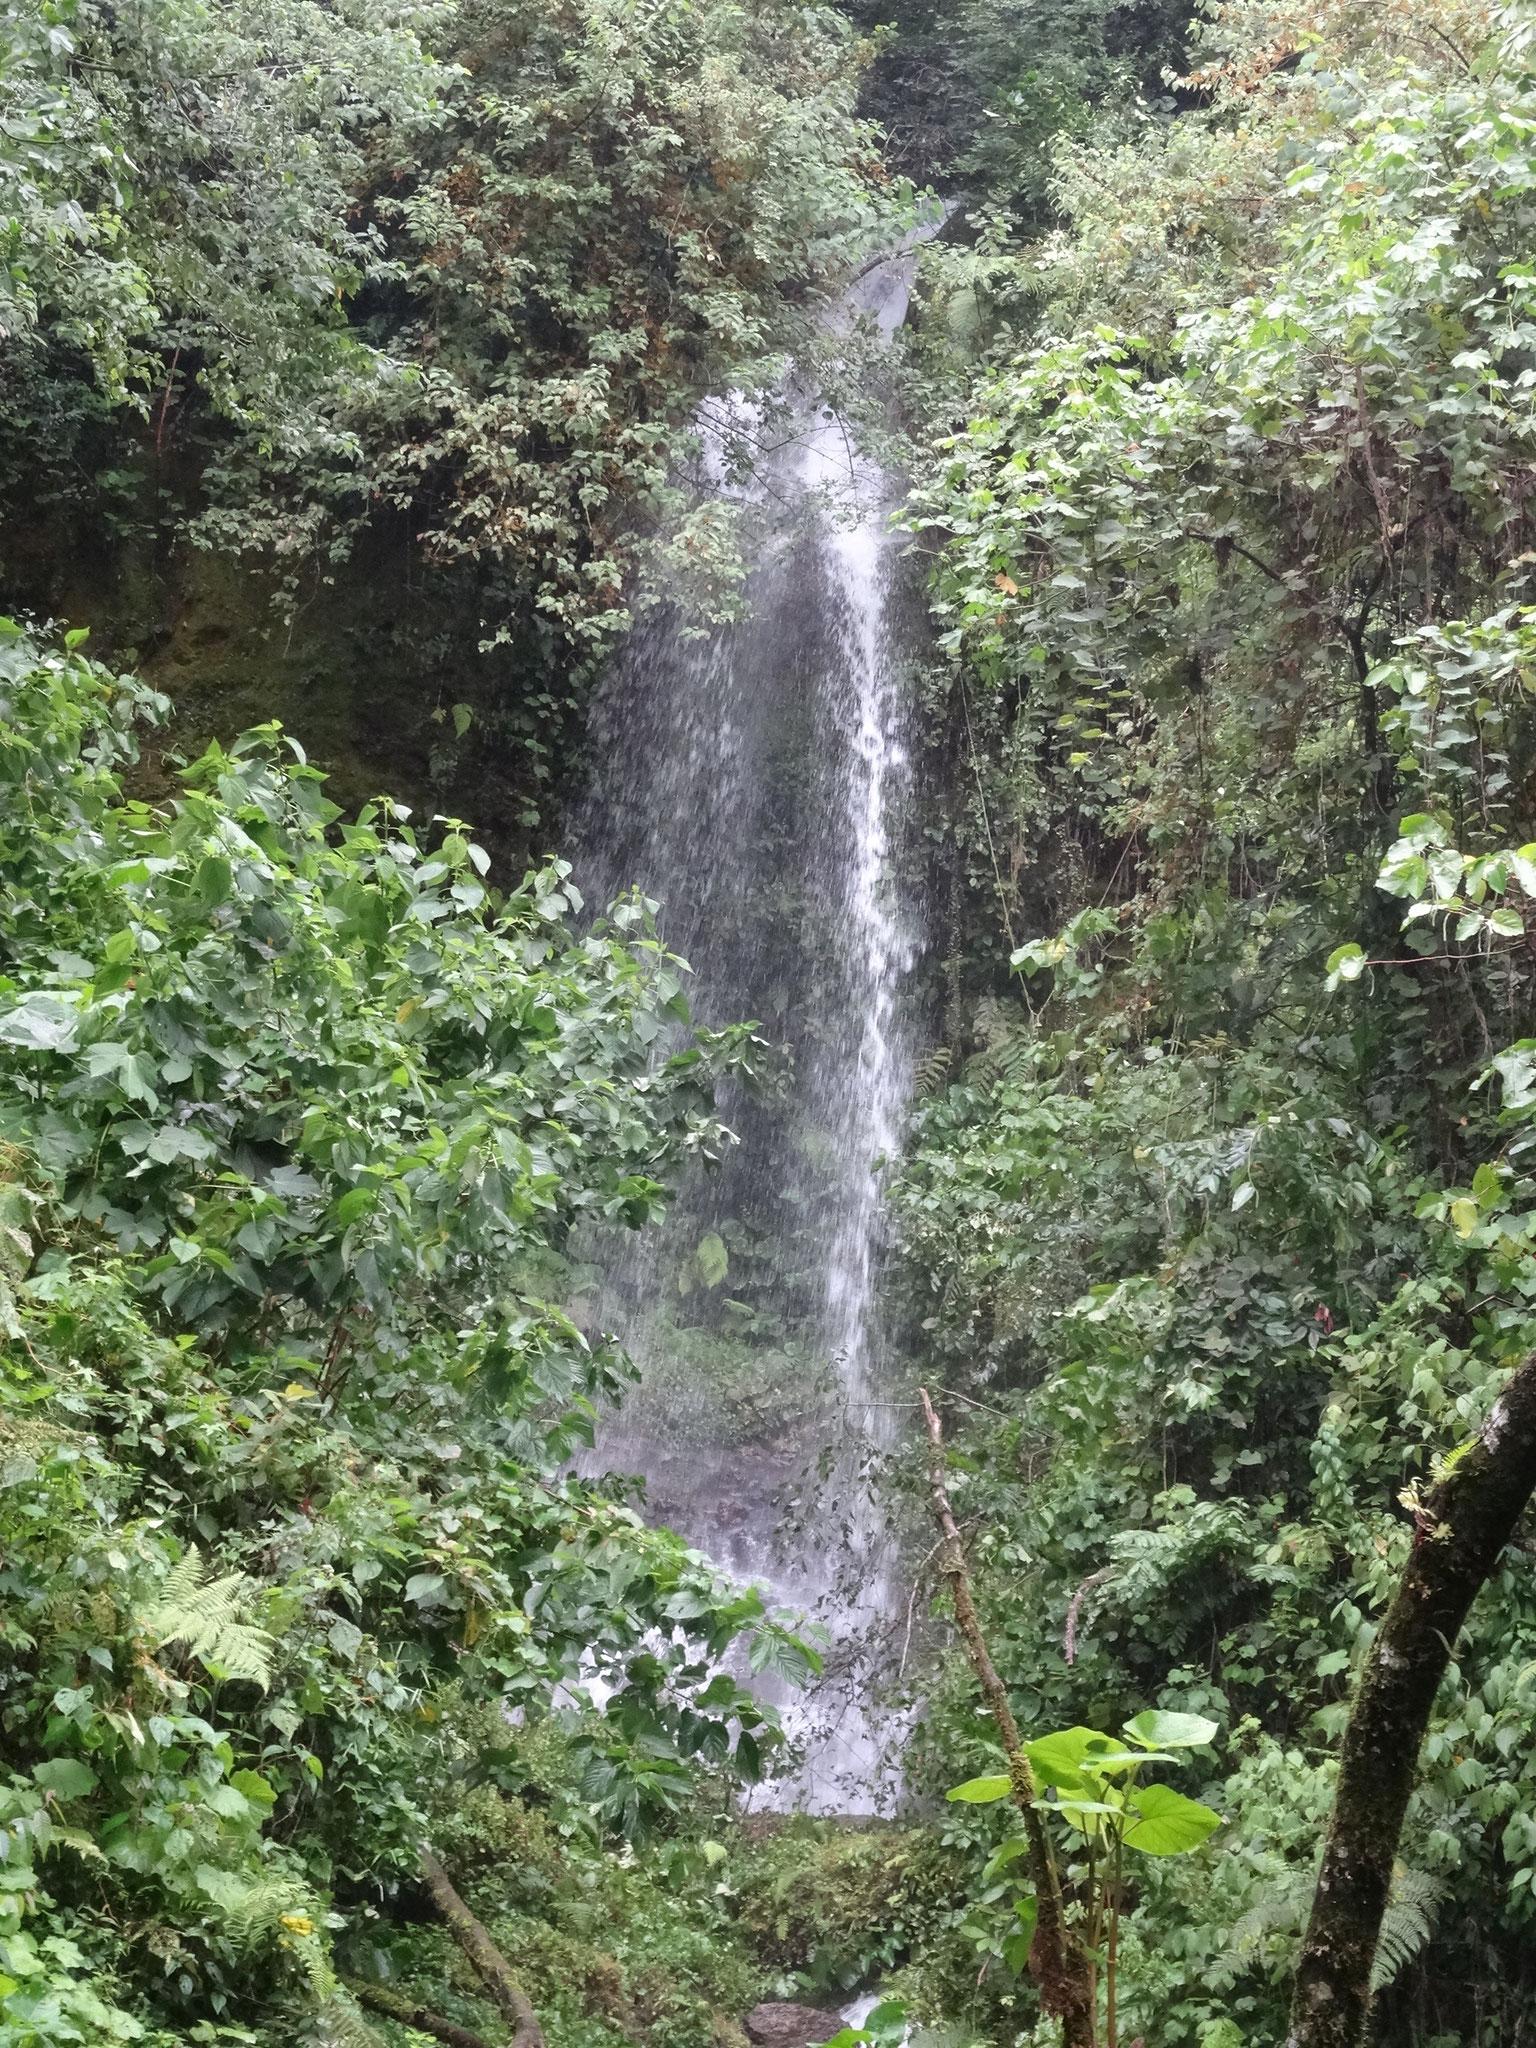 la 1ra cascada de SEMUK / der 1. Wasserfall von SEMUK